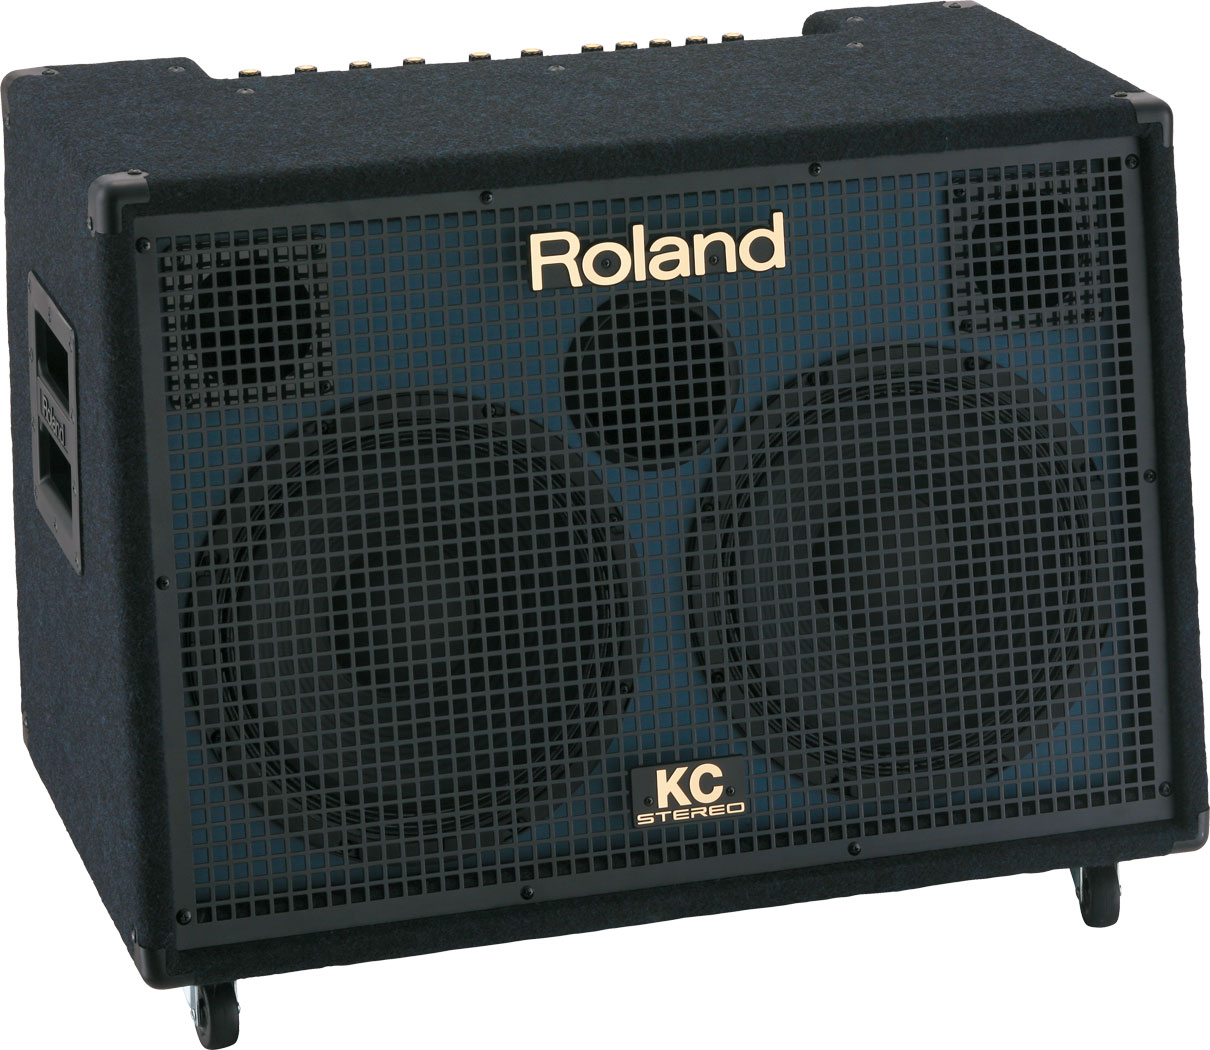 ROLAND KC-880 - ảnh 1